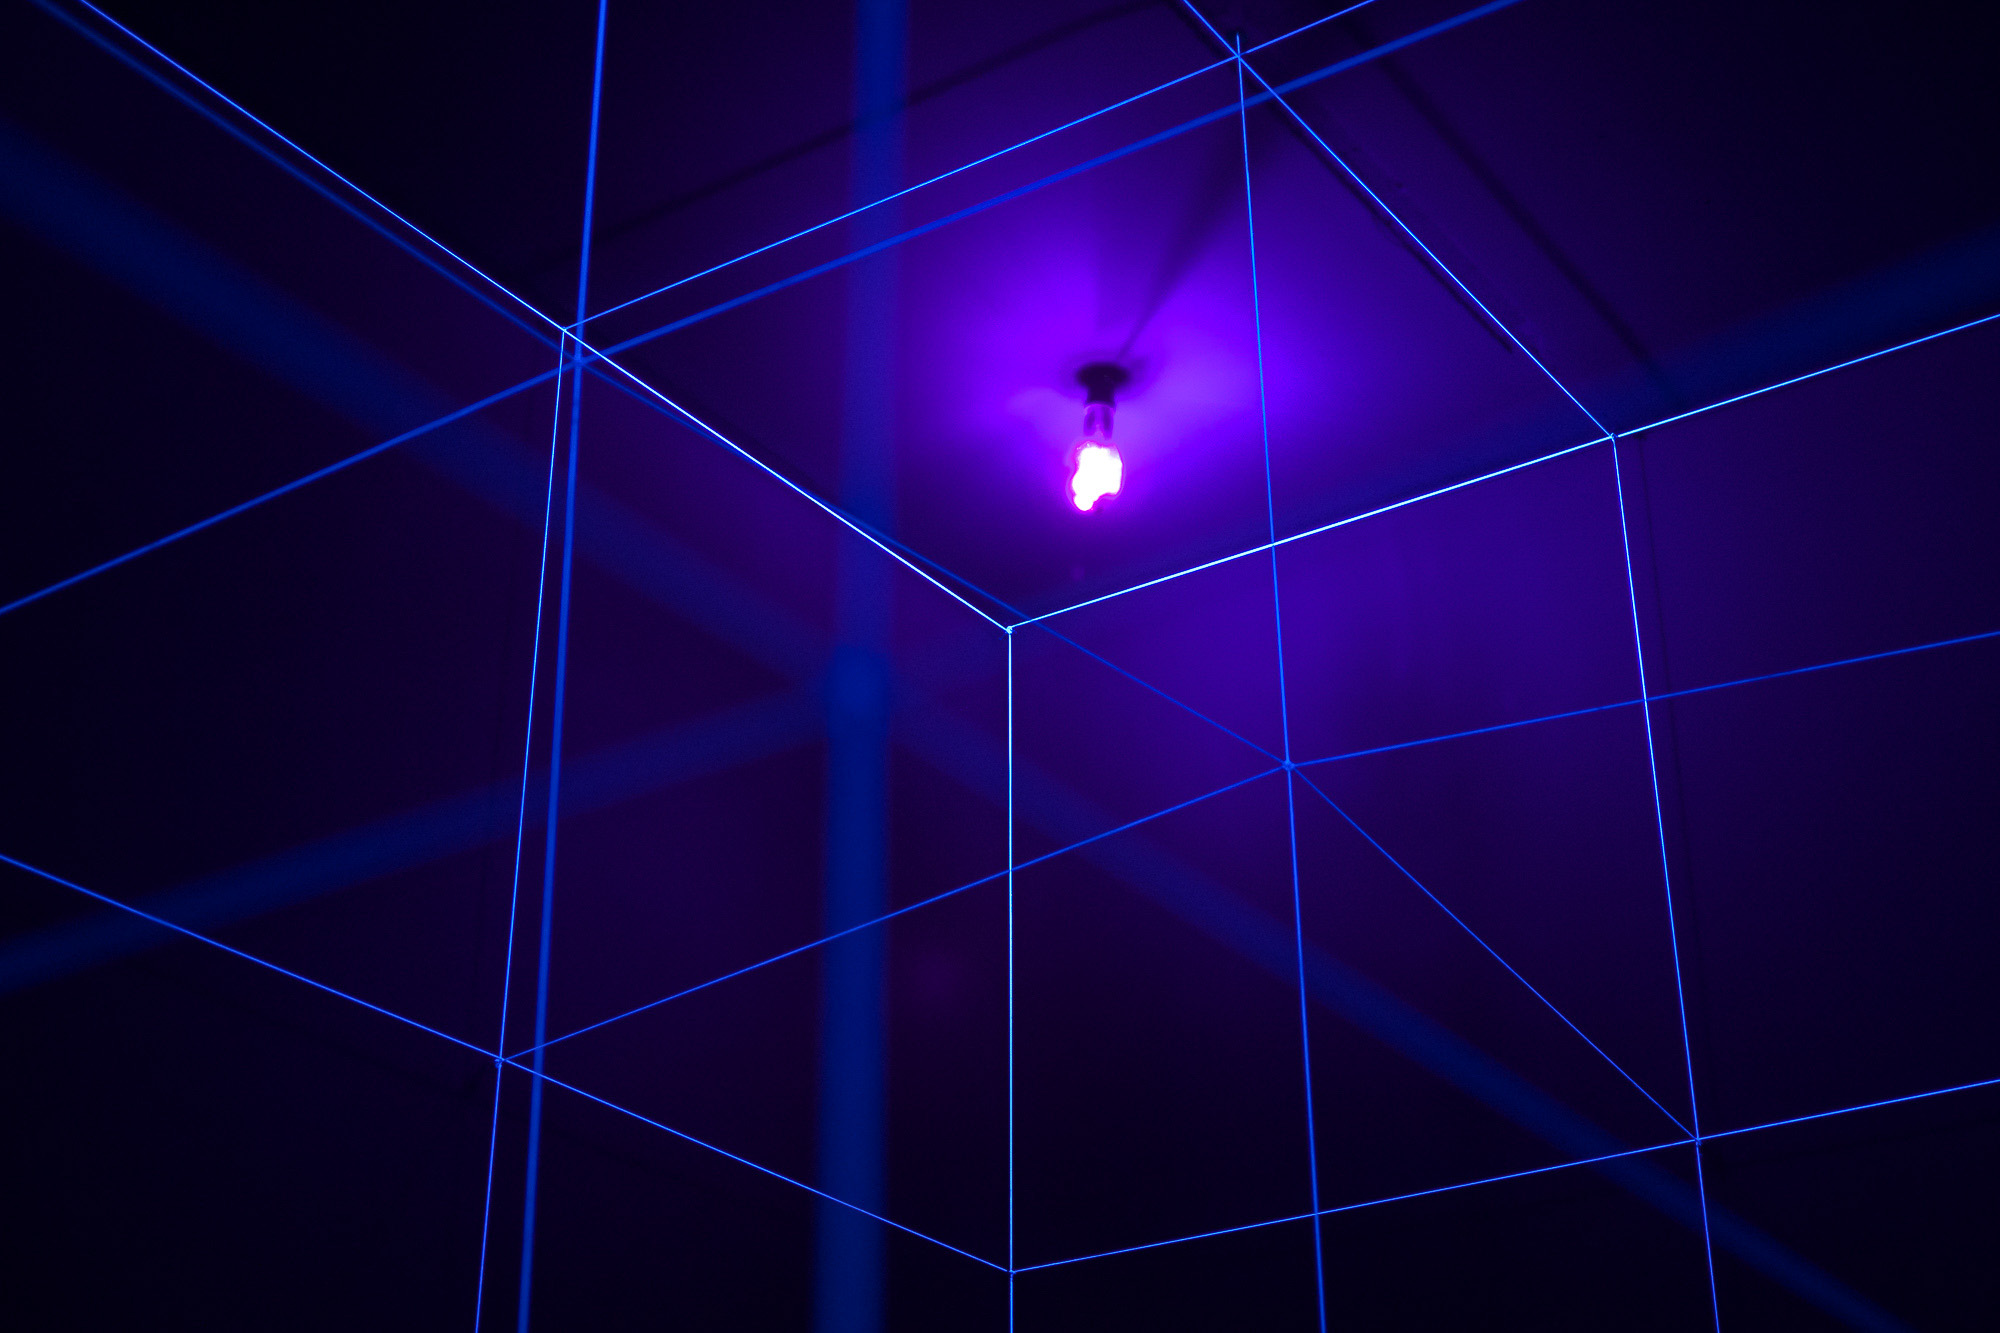 Lamp & Lines